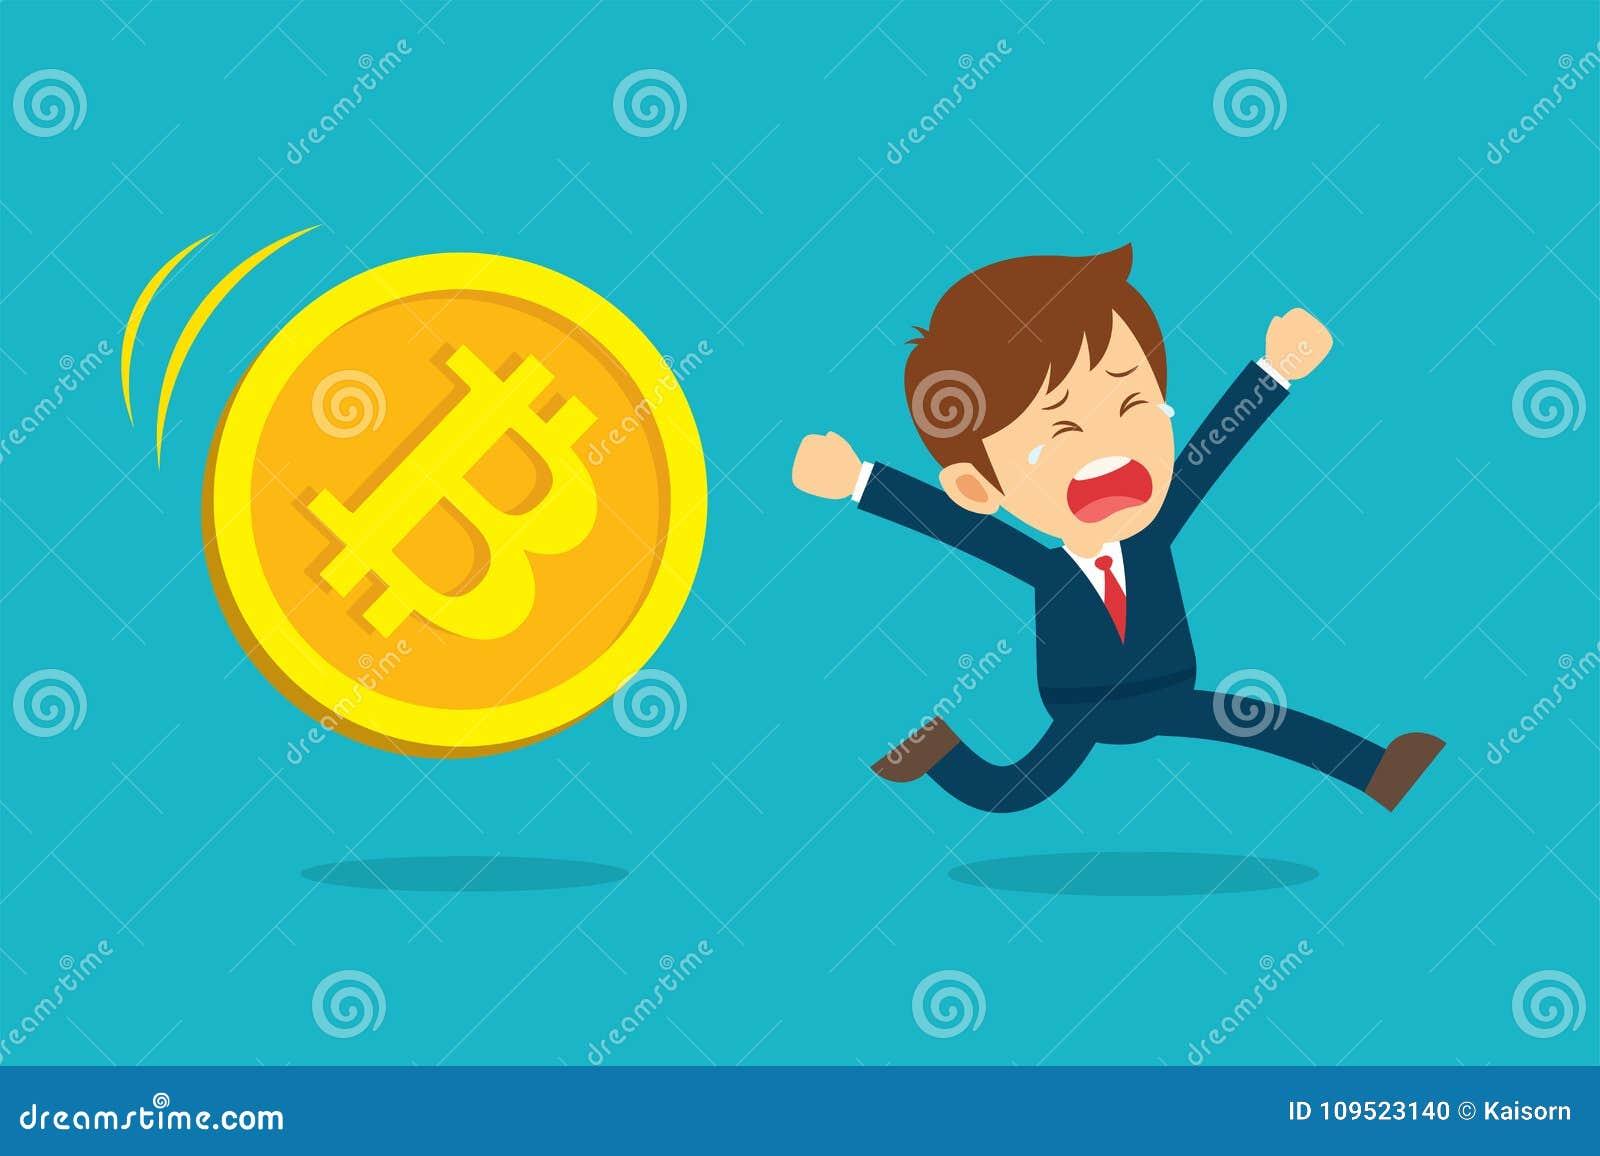 cryptocurrency market drop